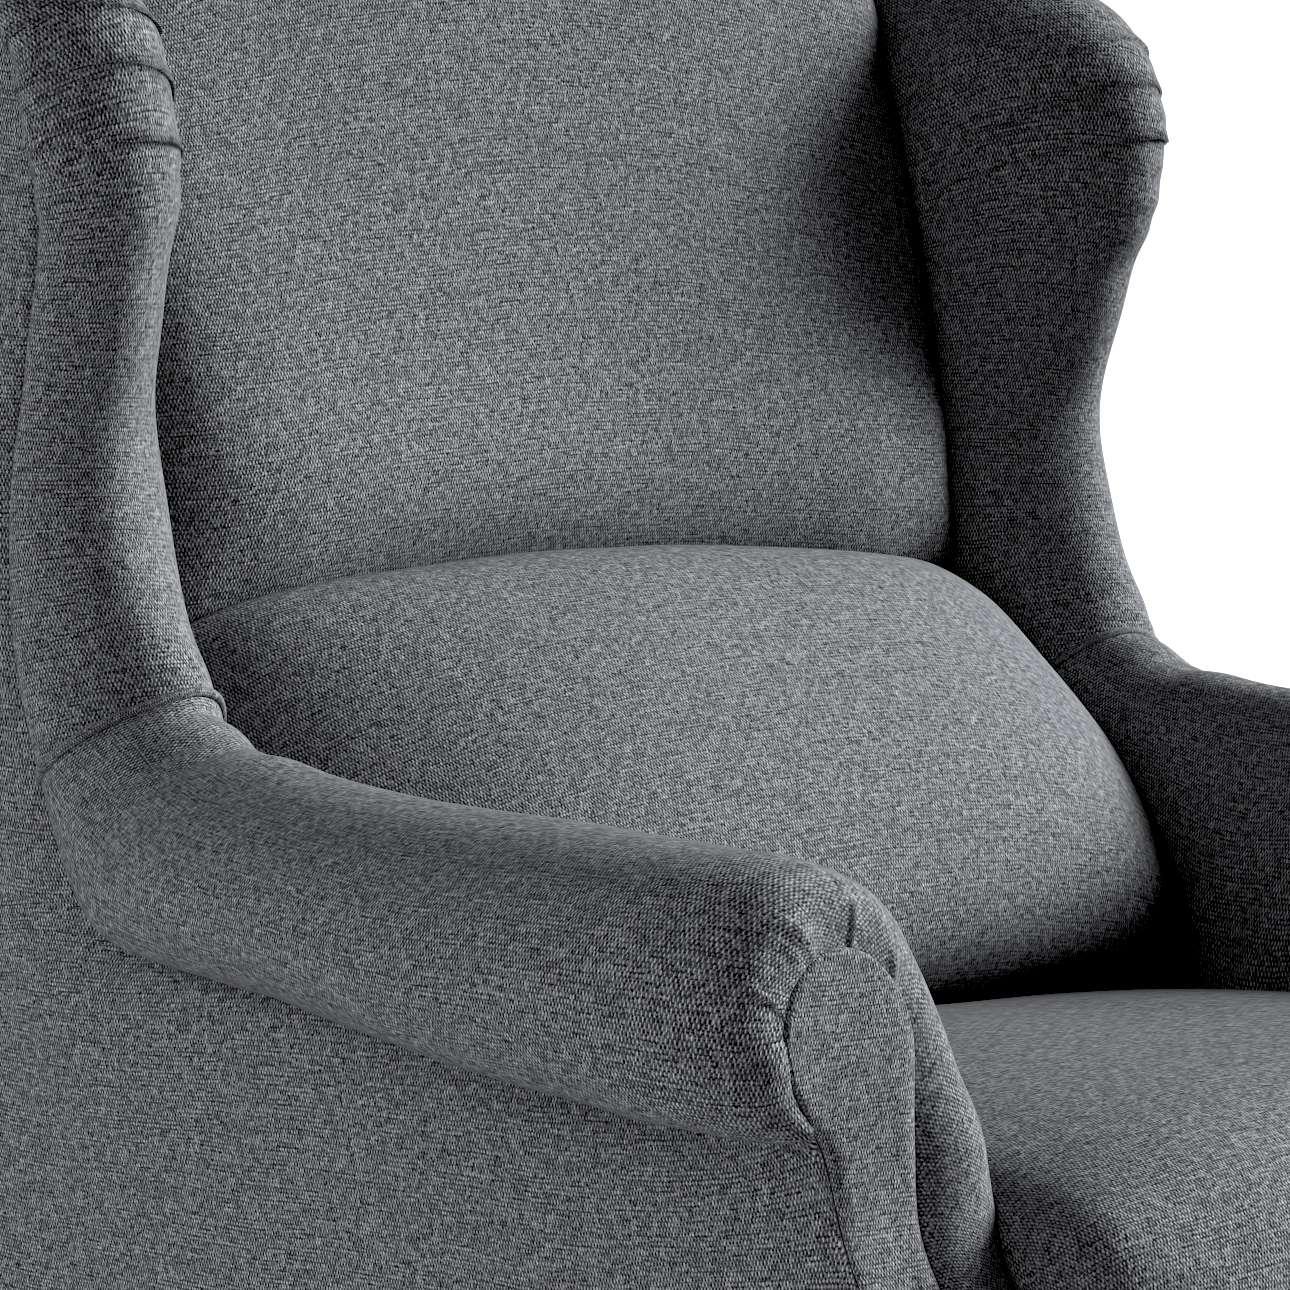 Fotel Unique w kolekcji Amsterdam, tkanina: 704-47